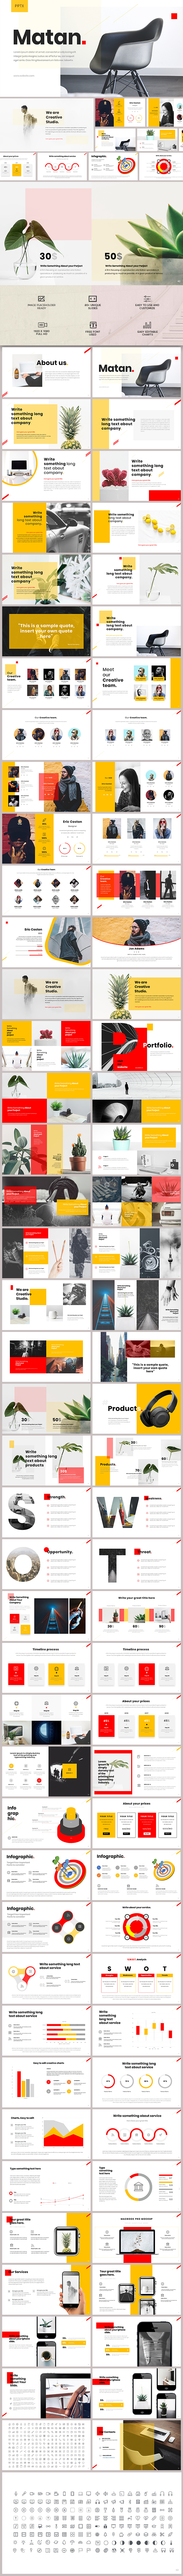 Matan Presentation Template - PowerPoint Templates Presentation Templates